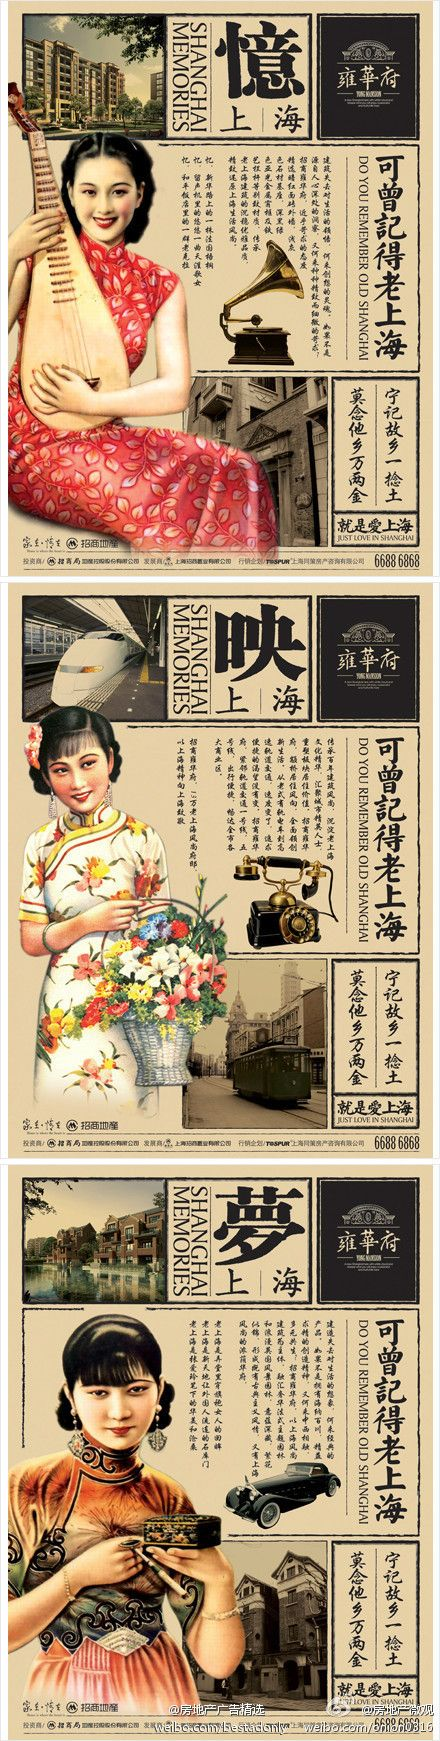 advertising set | Shanghai Memories Real Estate Campaign in China